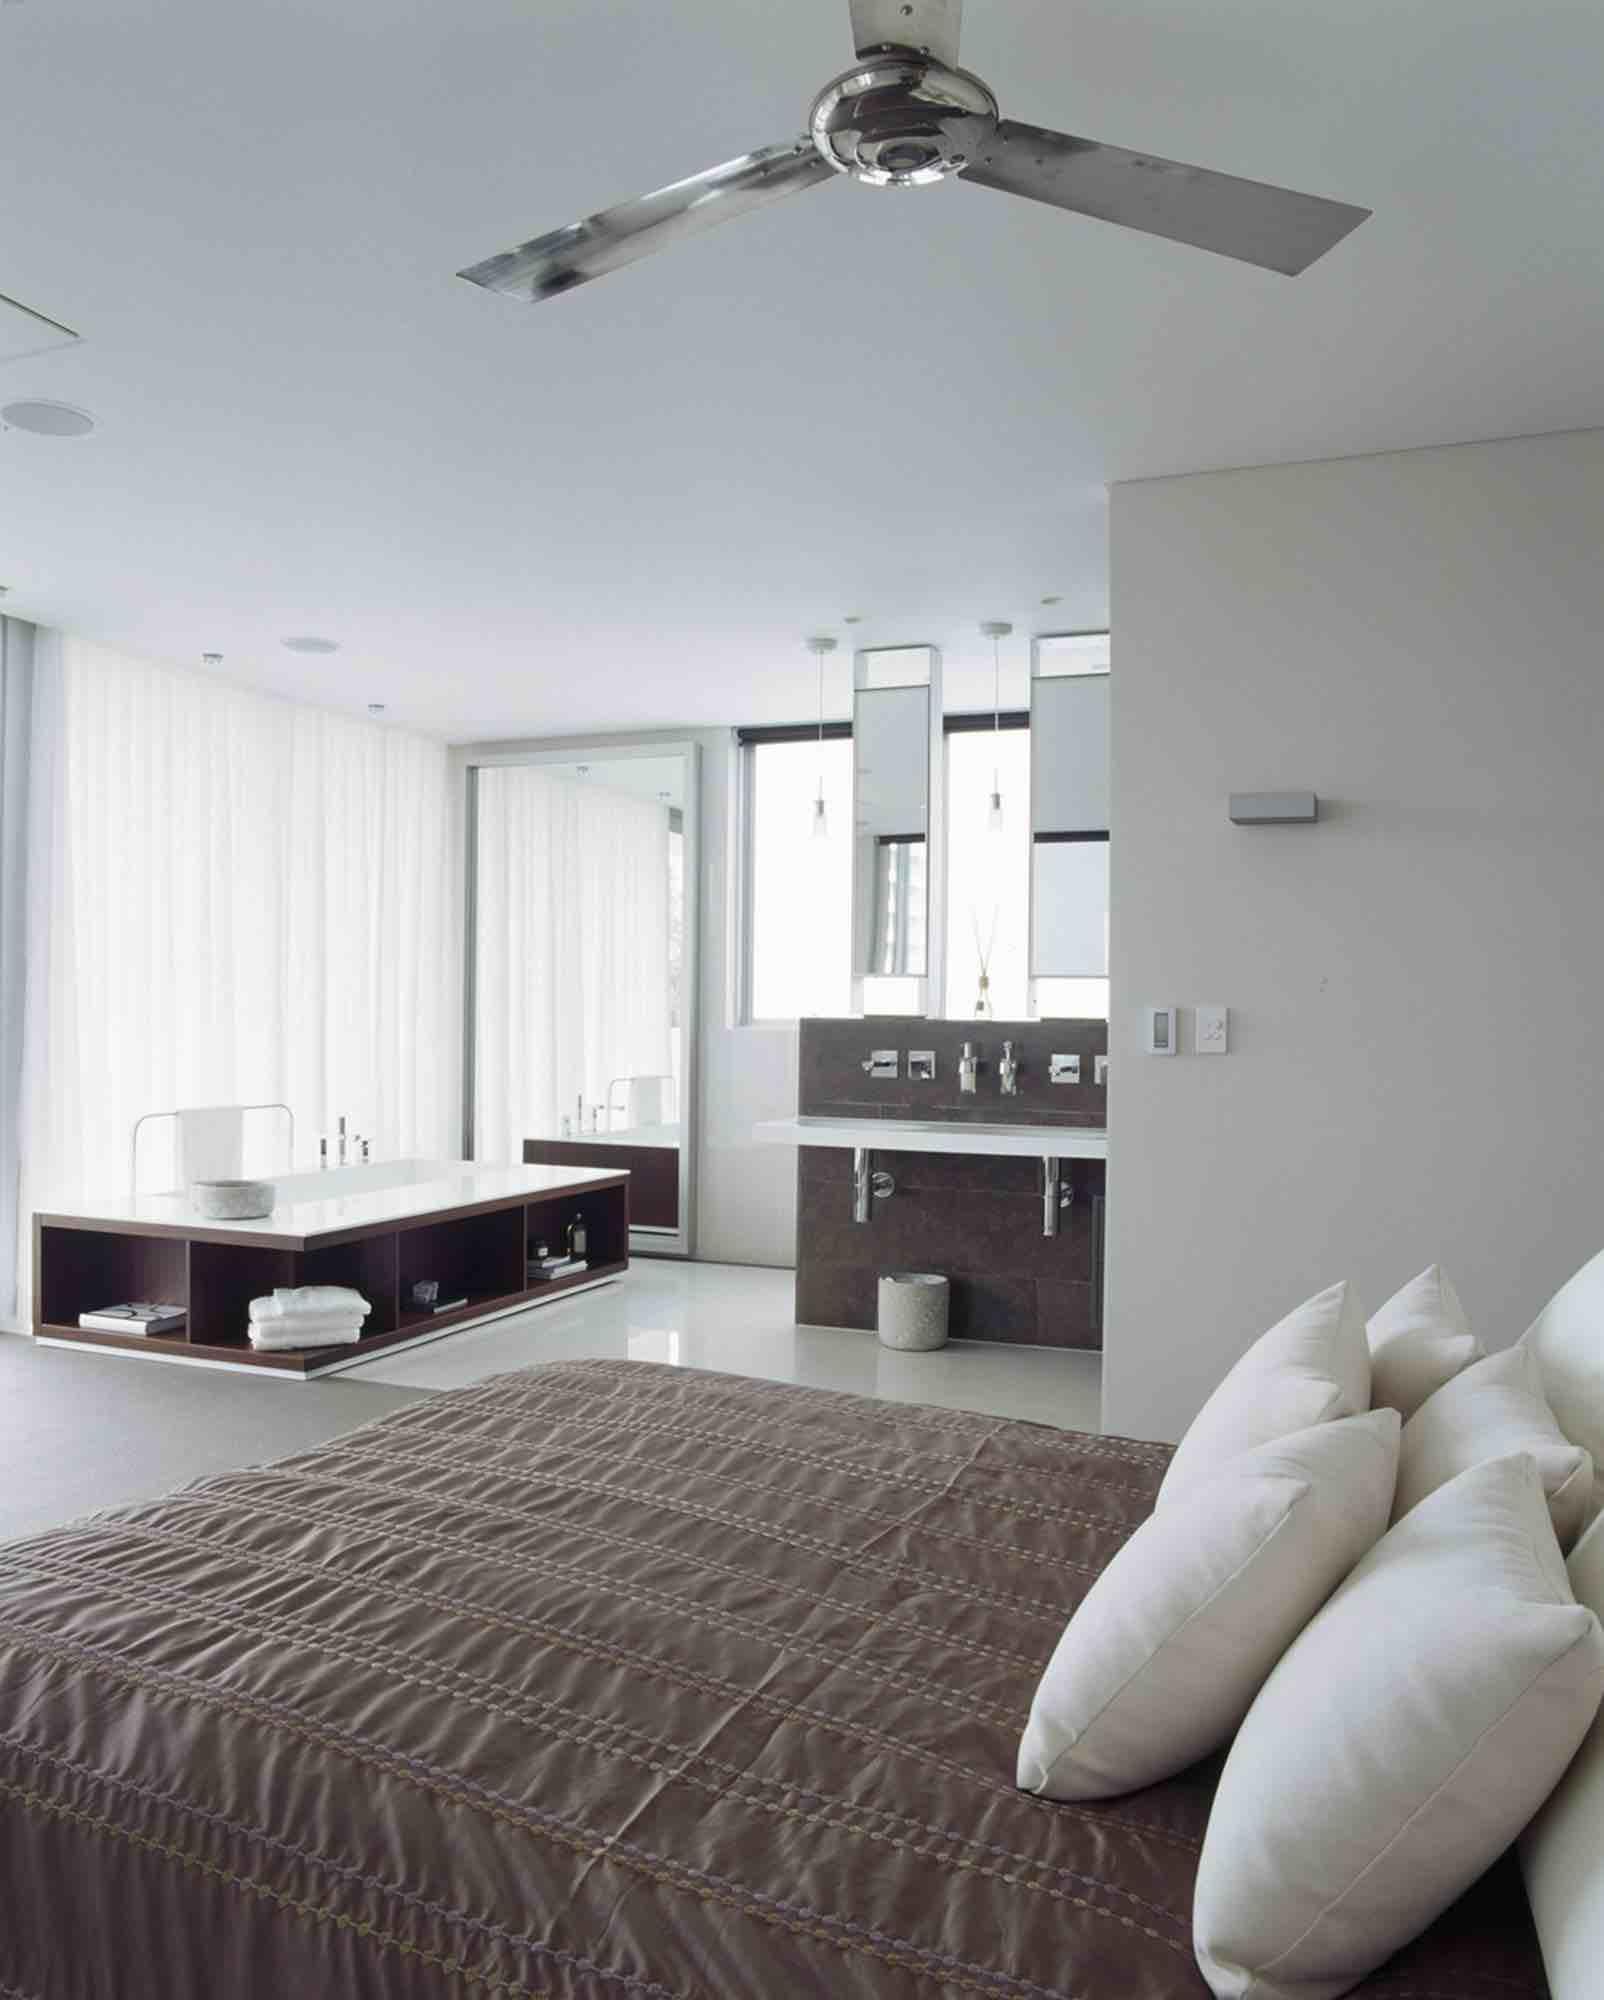 minosa-design-open-plan-ensuite-parents-retreat-dover-heights-portland-st-scooped-double-rifra-freestanding-corian-bath-shear-curtain-bathroom-04